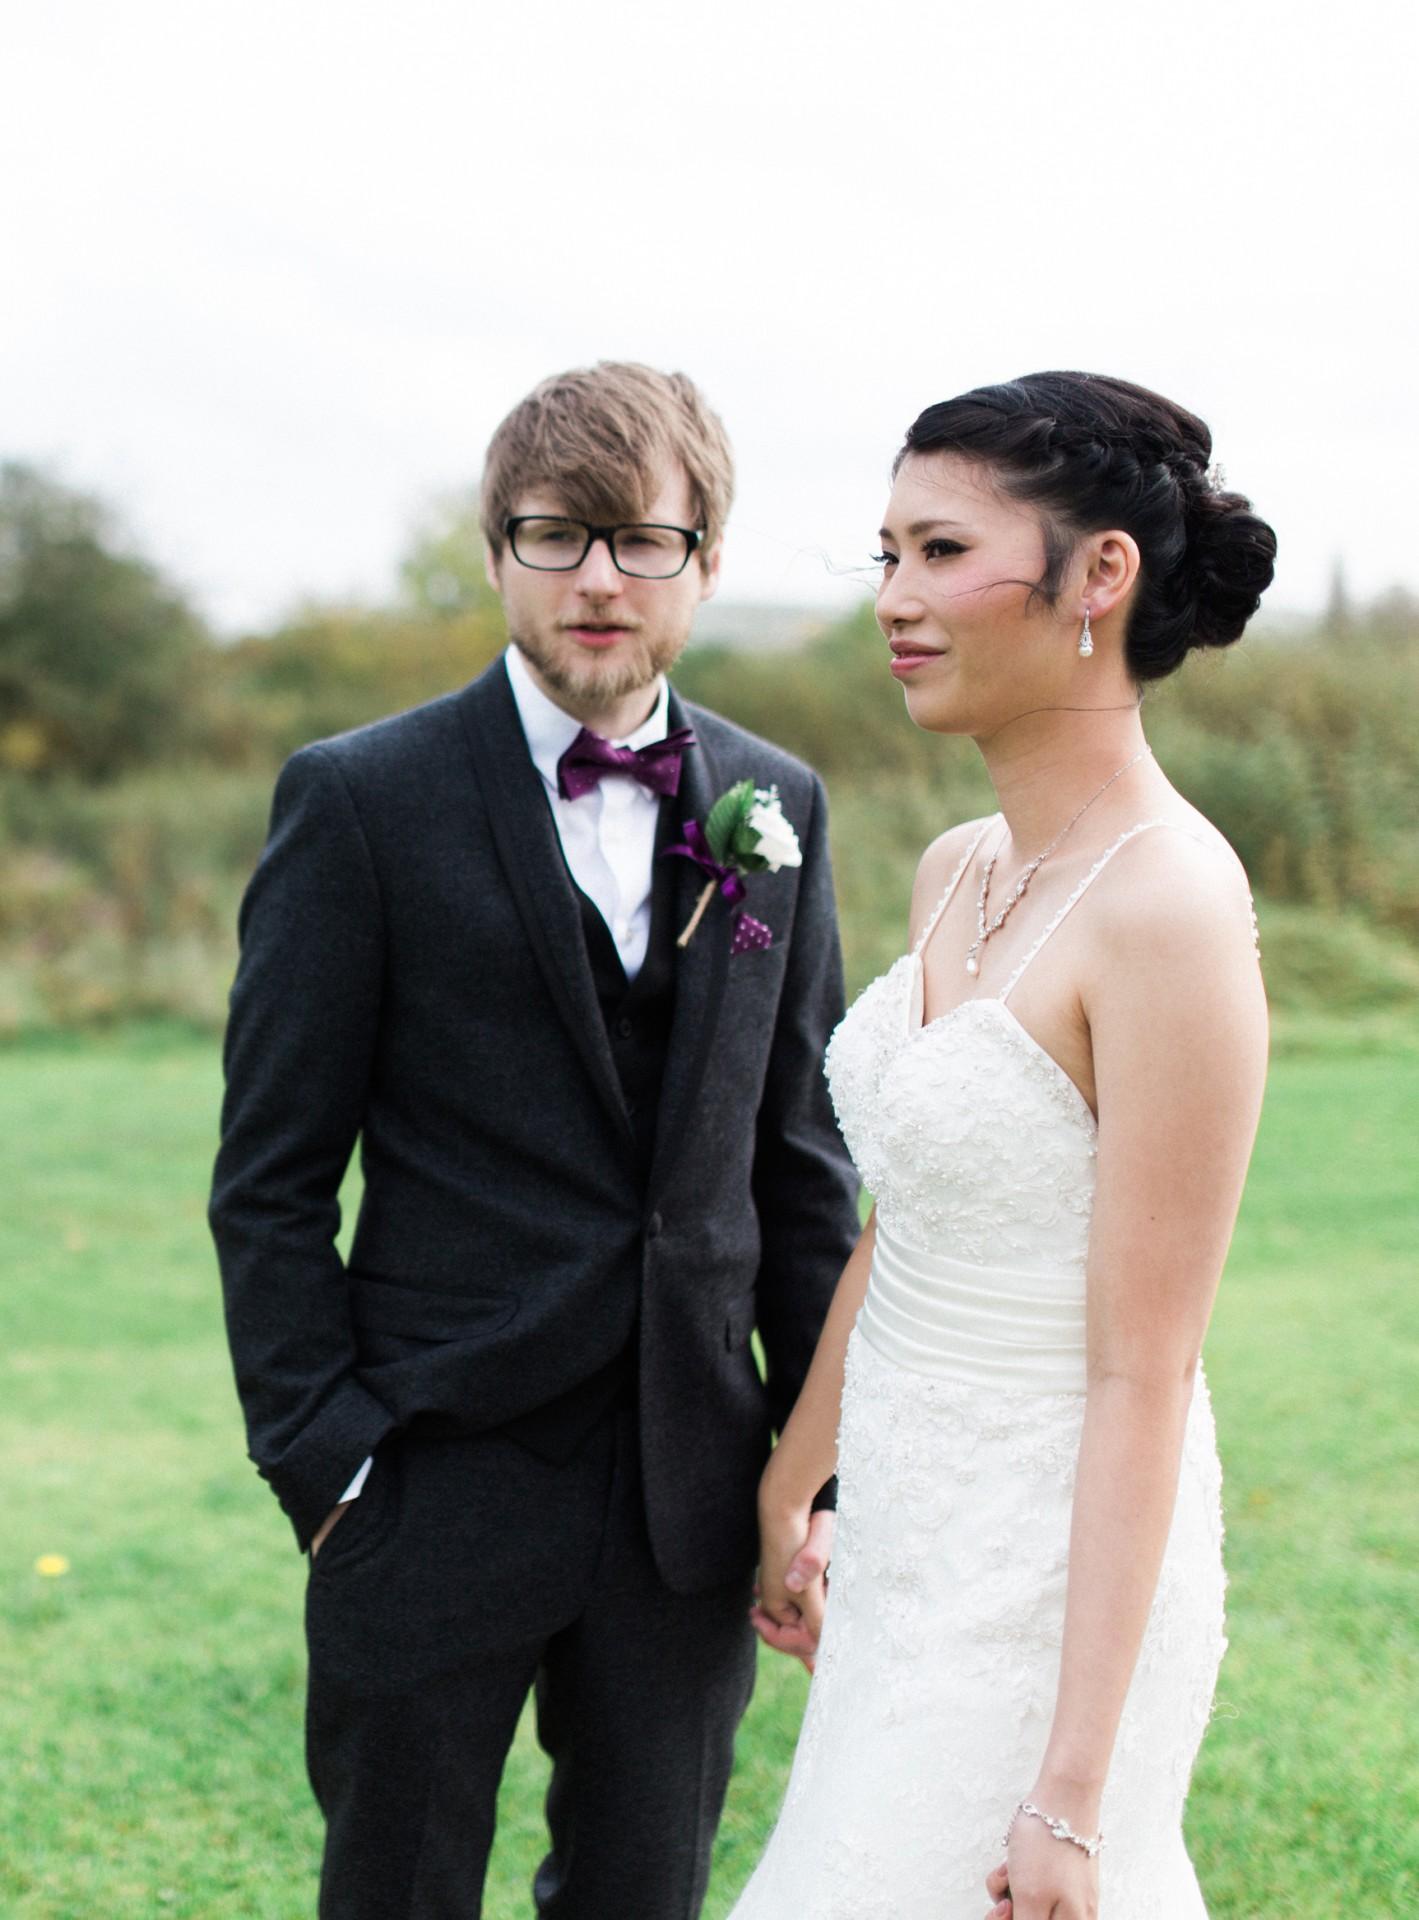 Chloe_Matt_Chinese-Rustic-Wedding_SBS_013